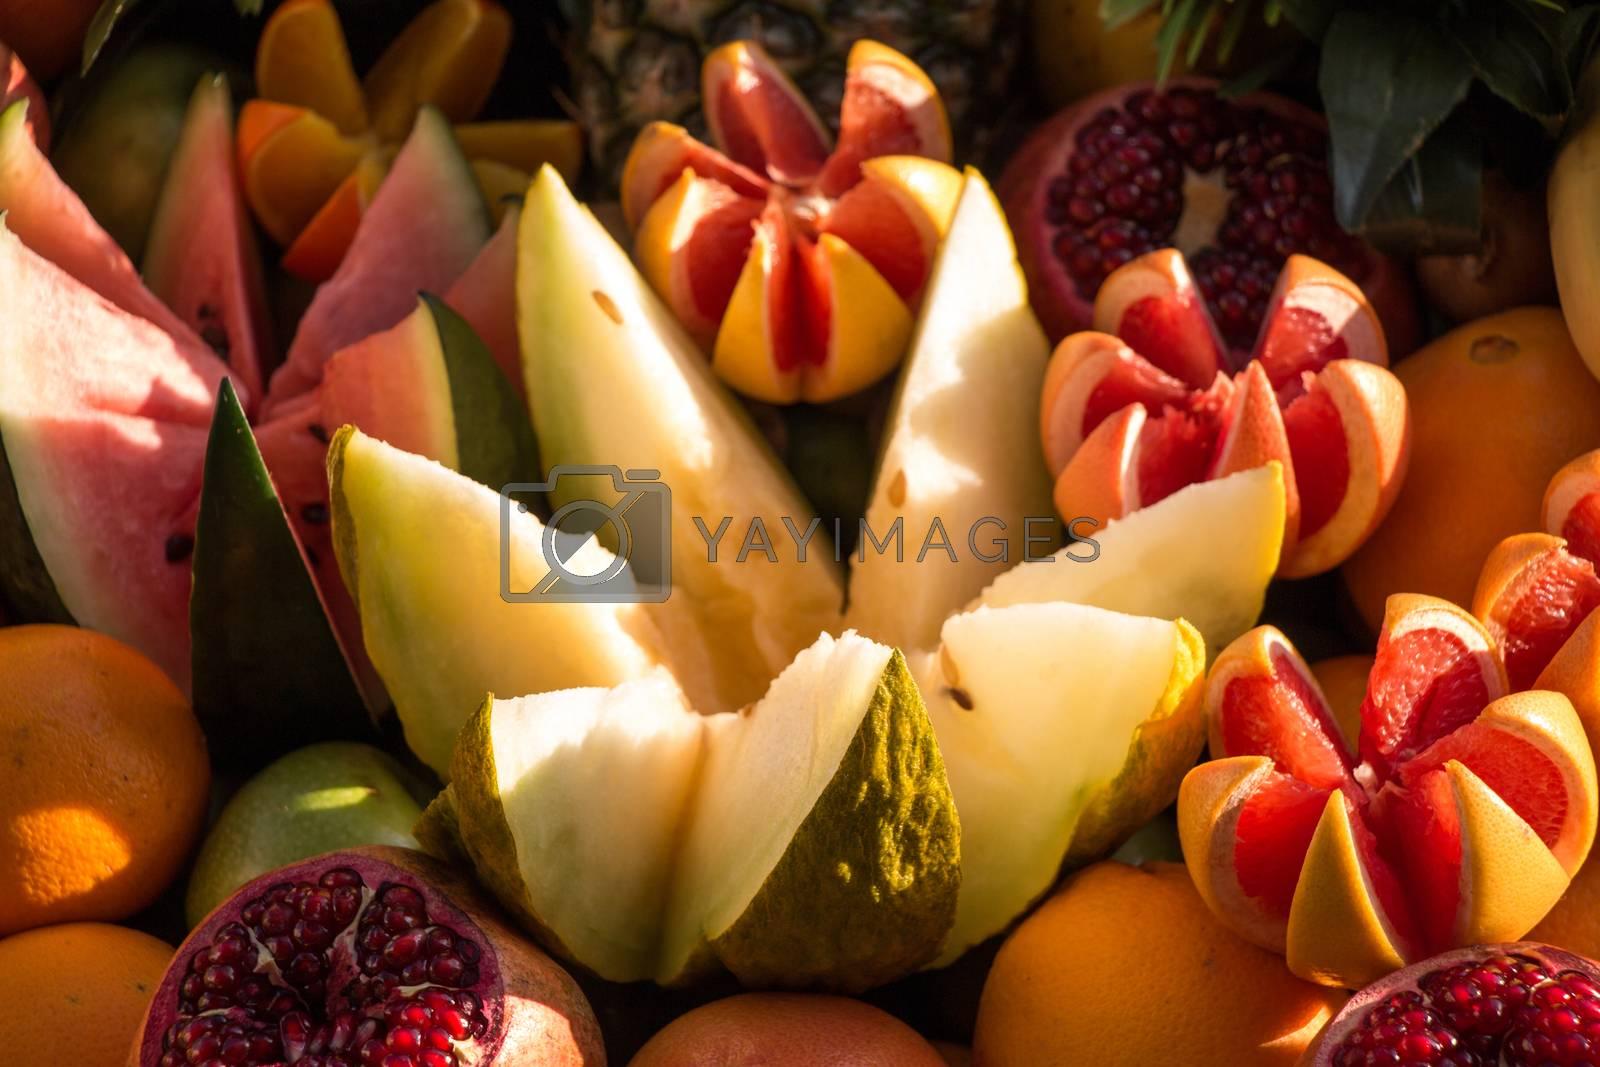 Grapefruits, mangoes, pomegranates, oranges, bananas, kiwis and melons